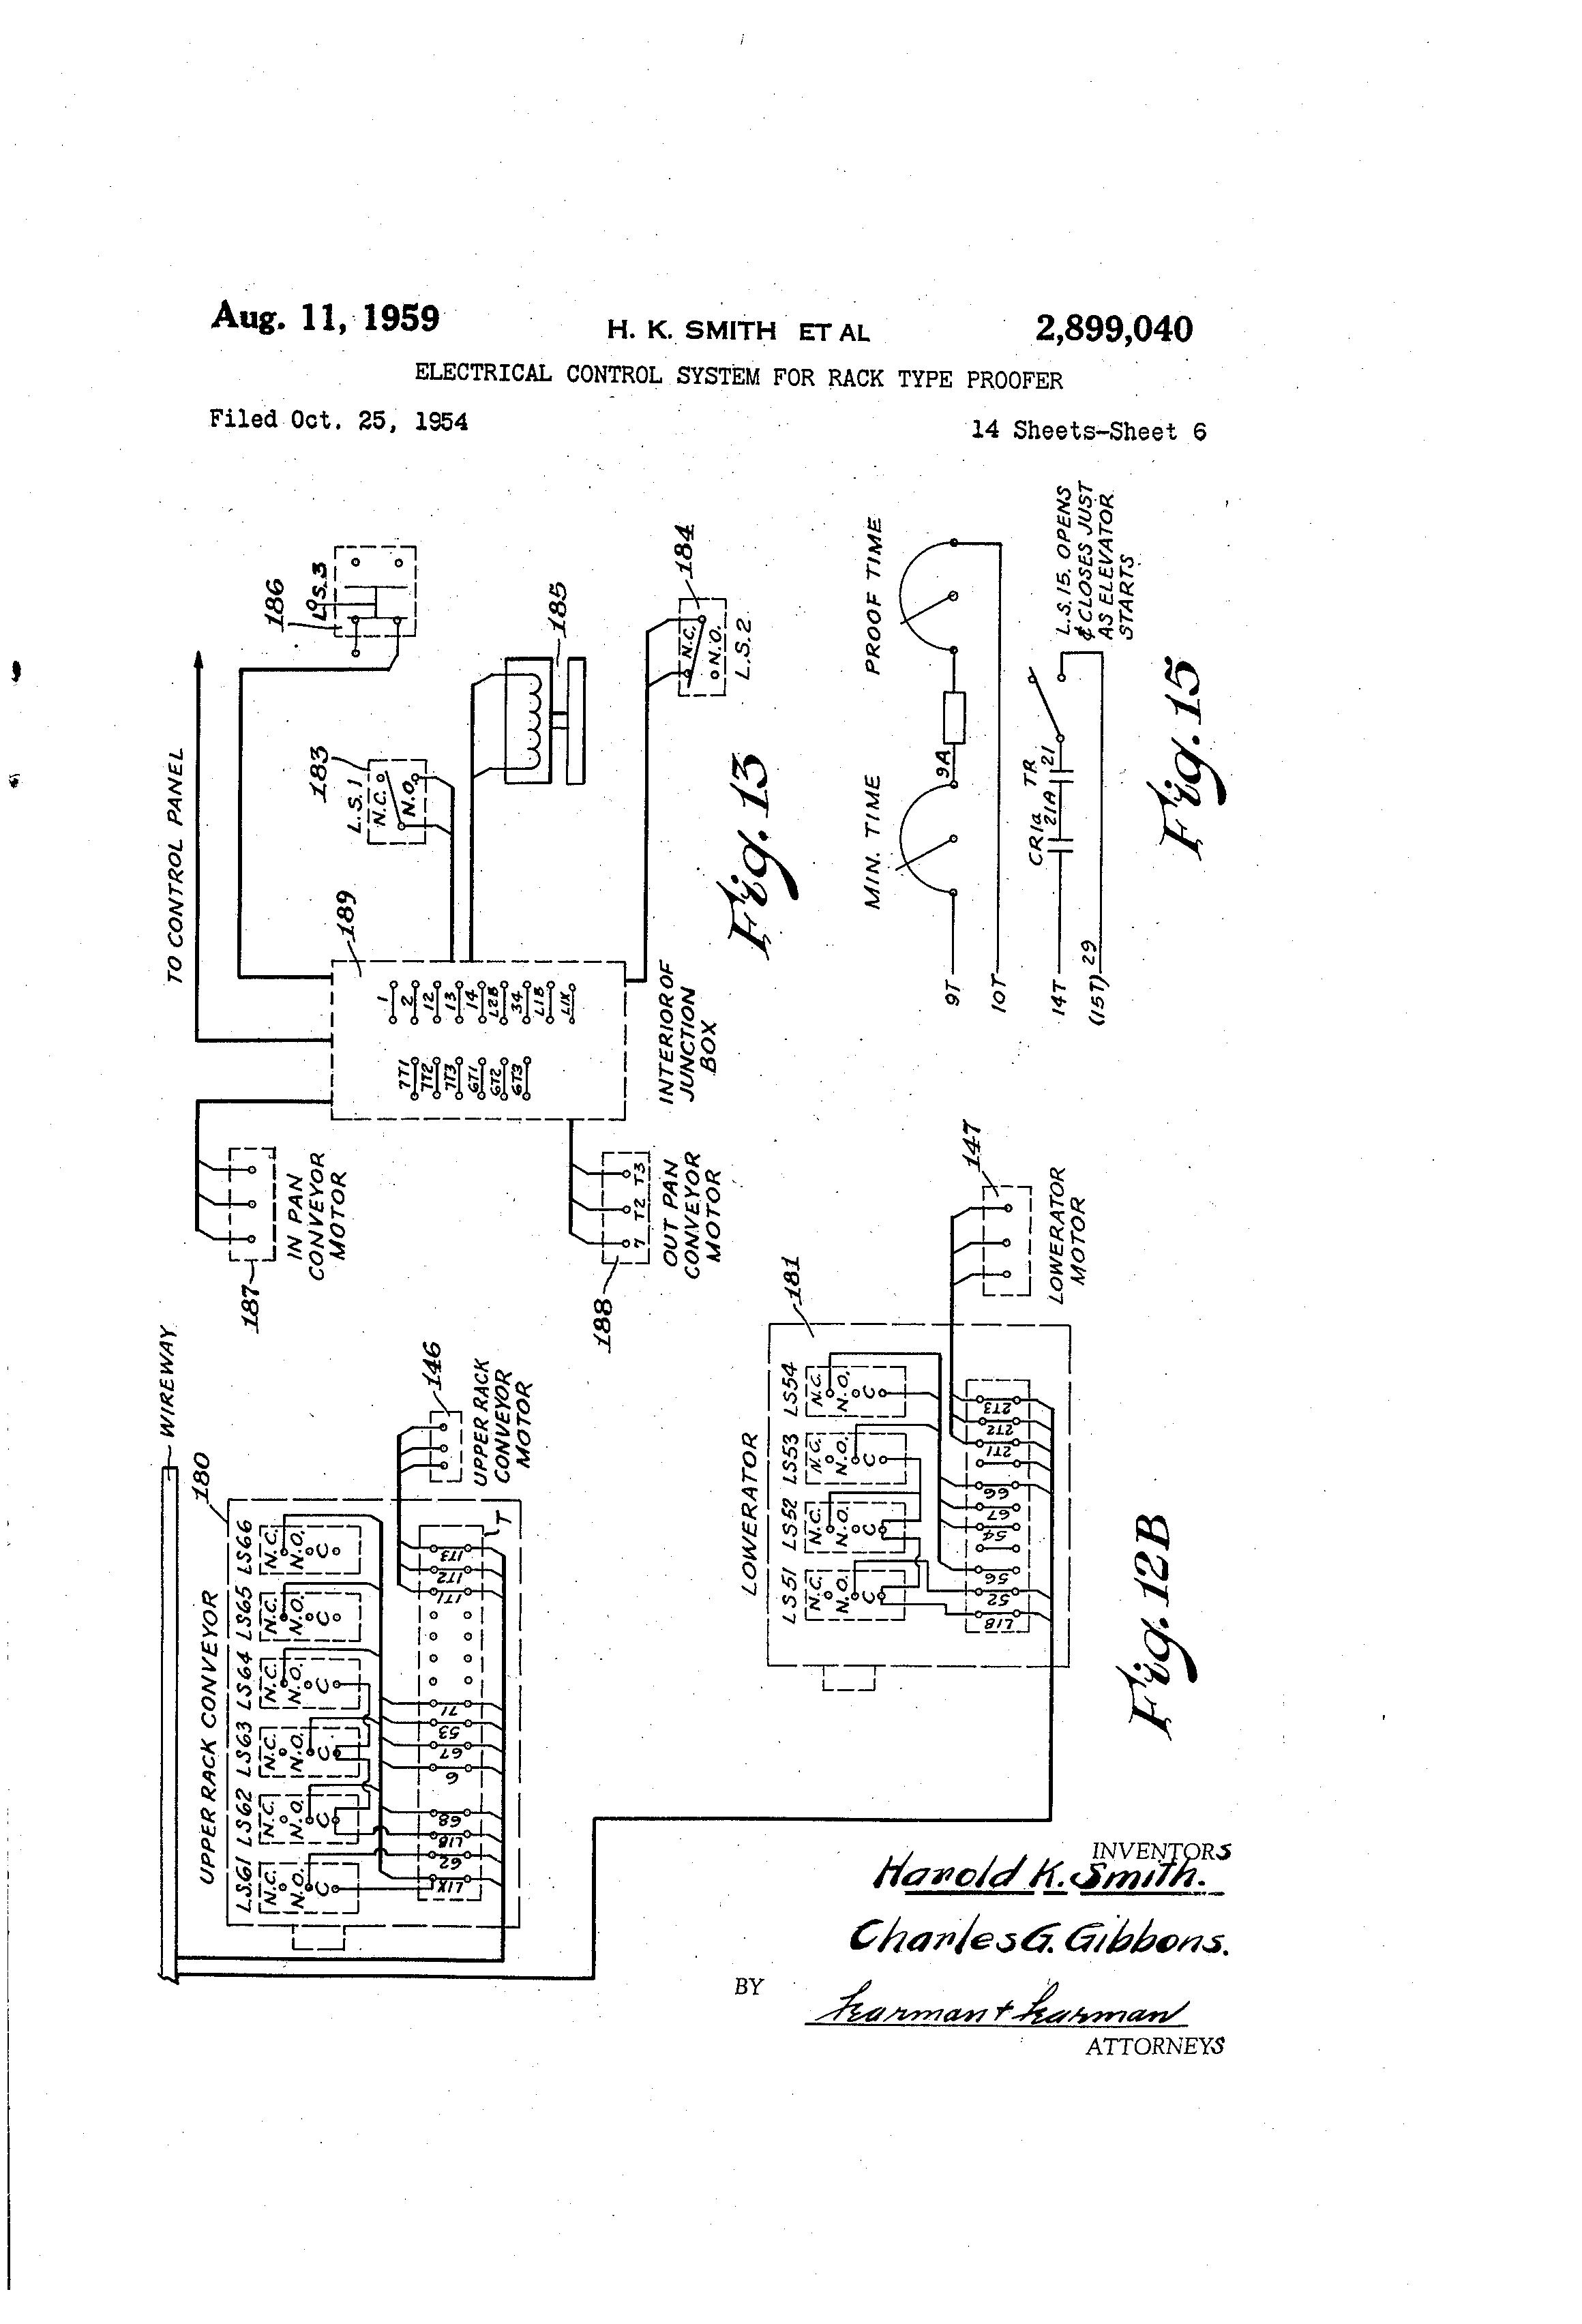 Surprising Us Motor 1874 Wiring Wiring Diagram Database Wiring Cloud Oideiuggs Outletorg